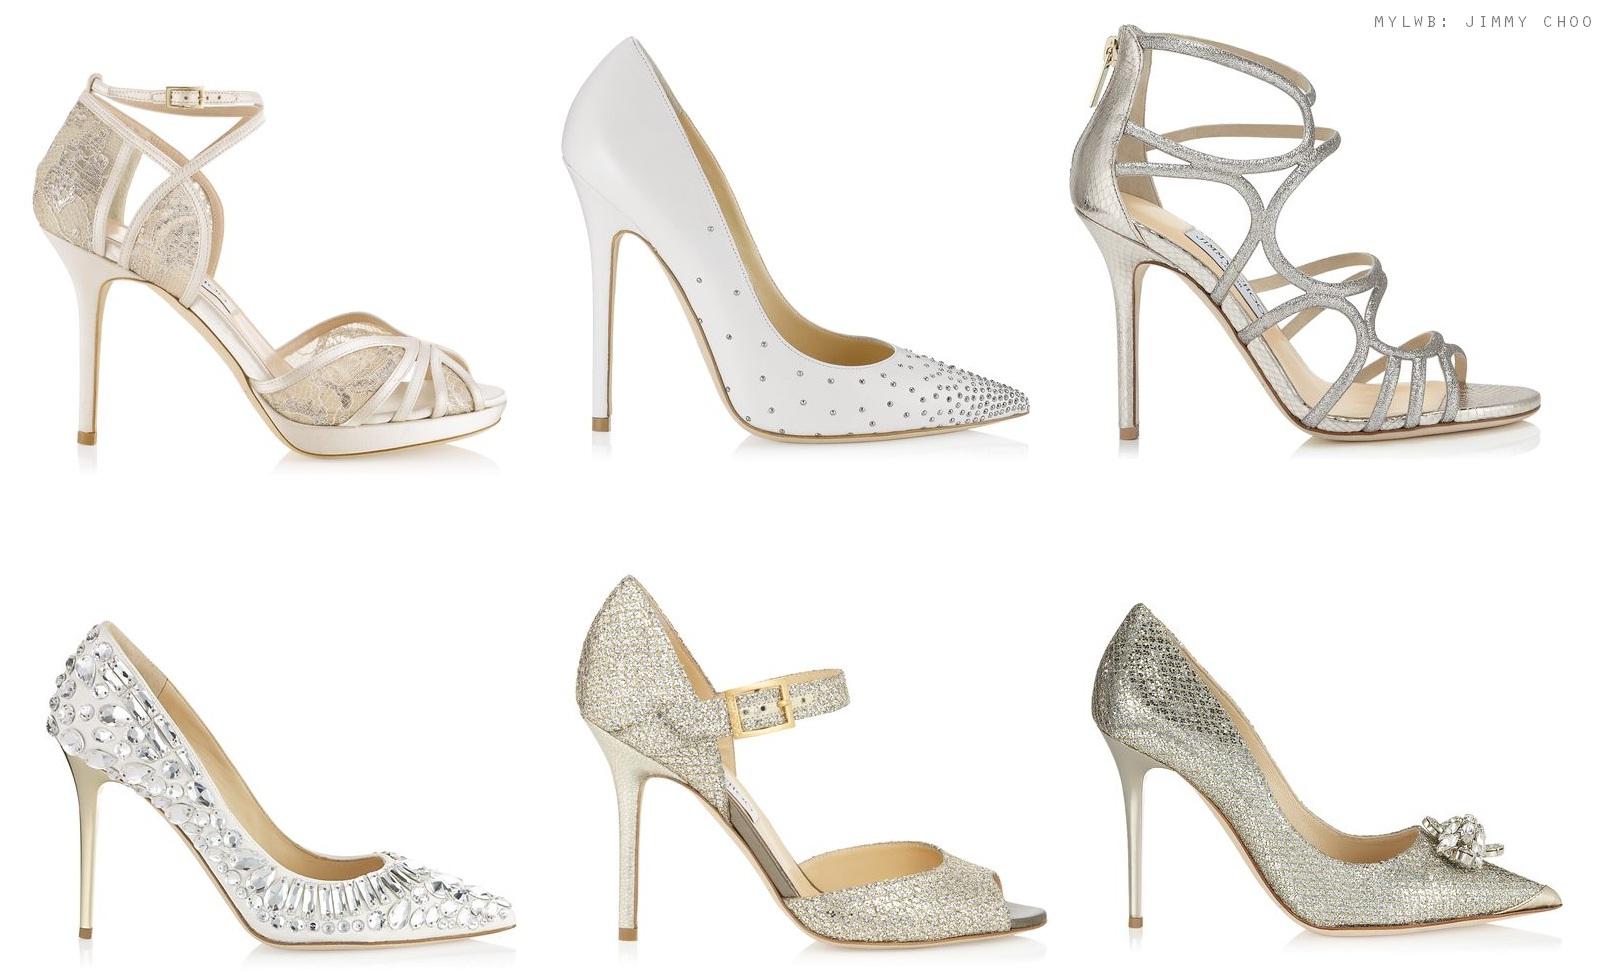 bridal shoes accessories jimmy choo wedding shoes Jimmy Choo bridal shoe collection